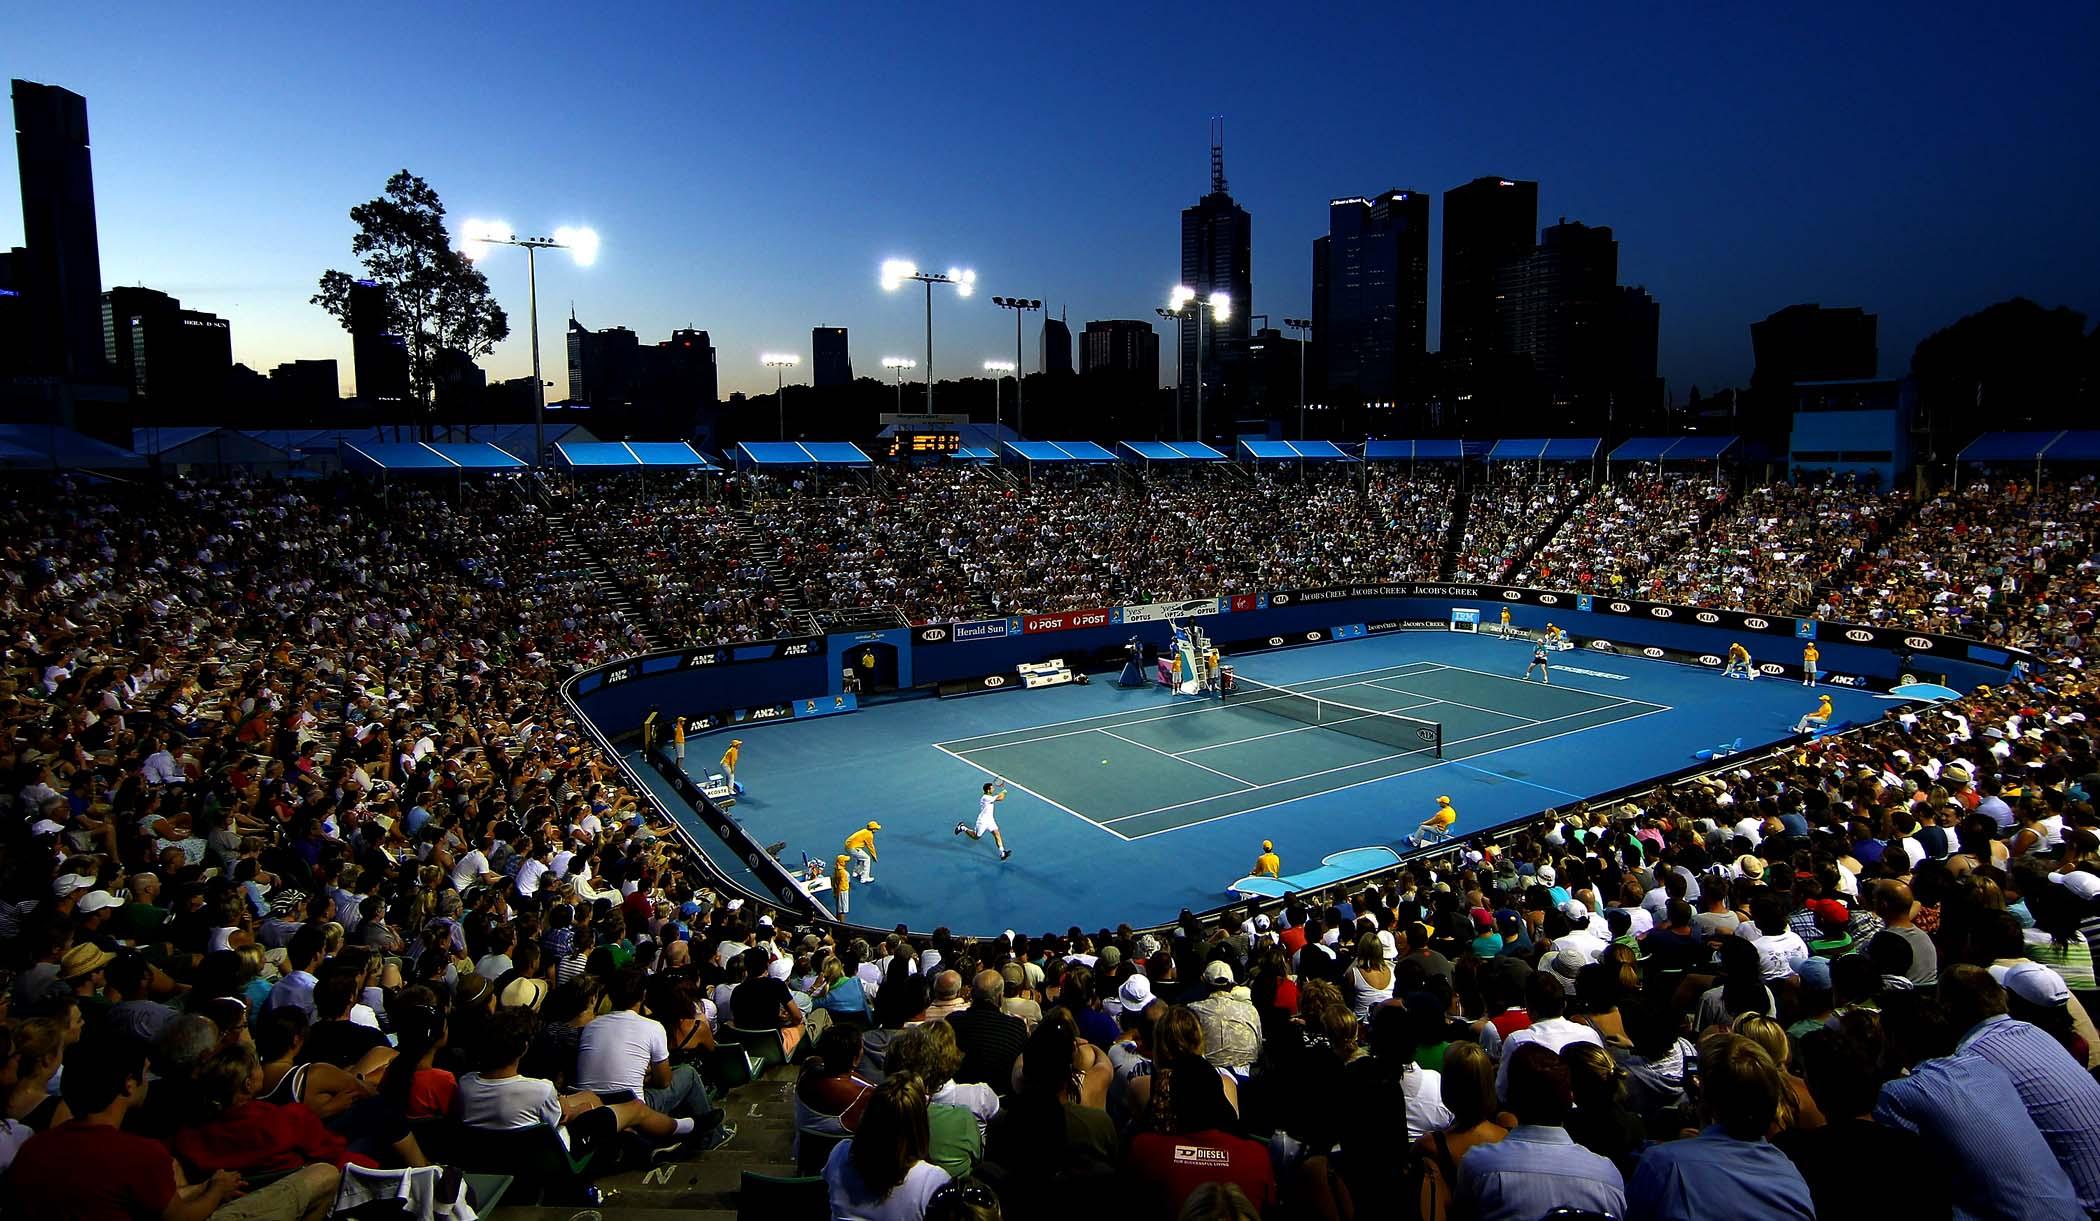 2016 Australian Open - betclic